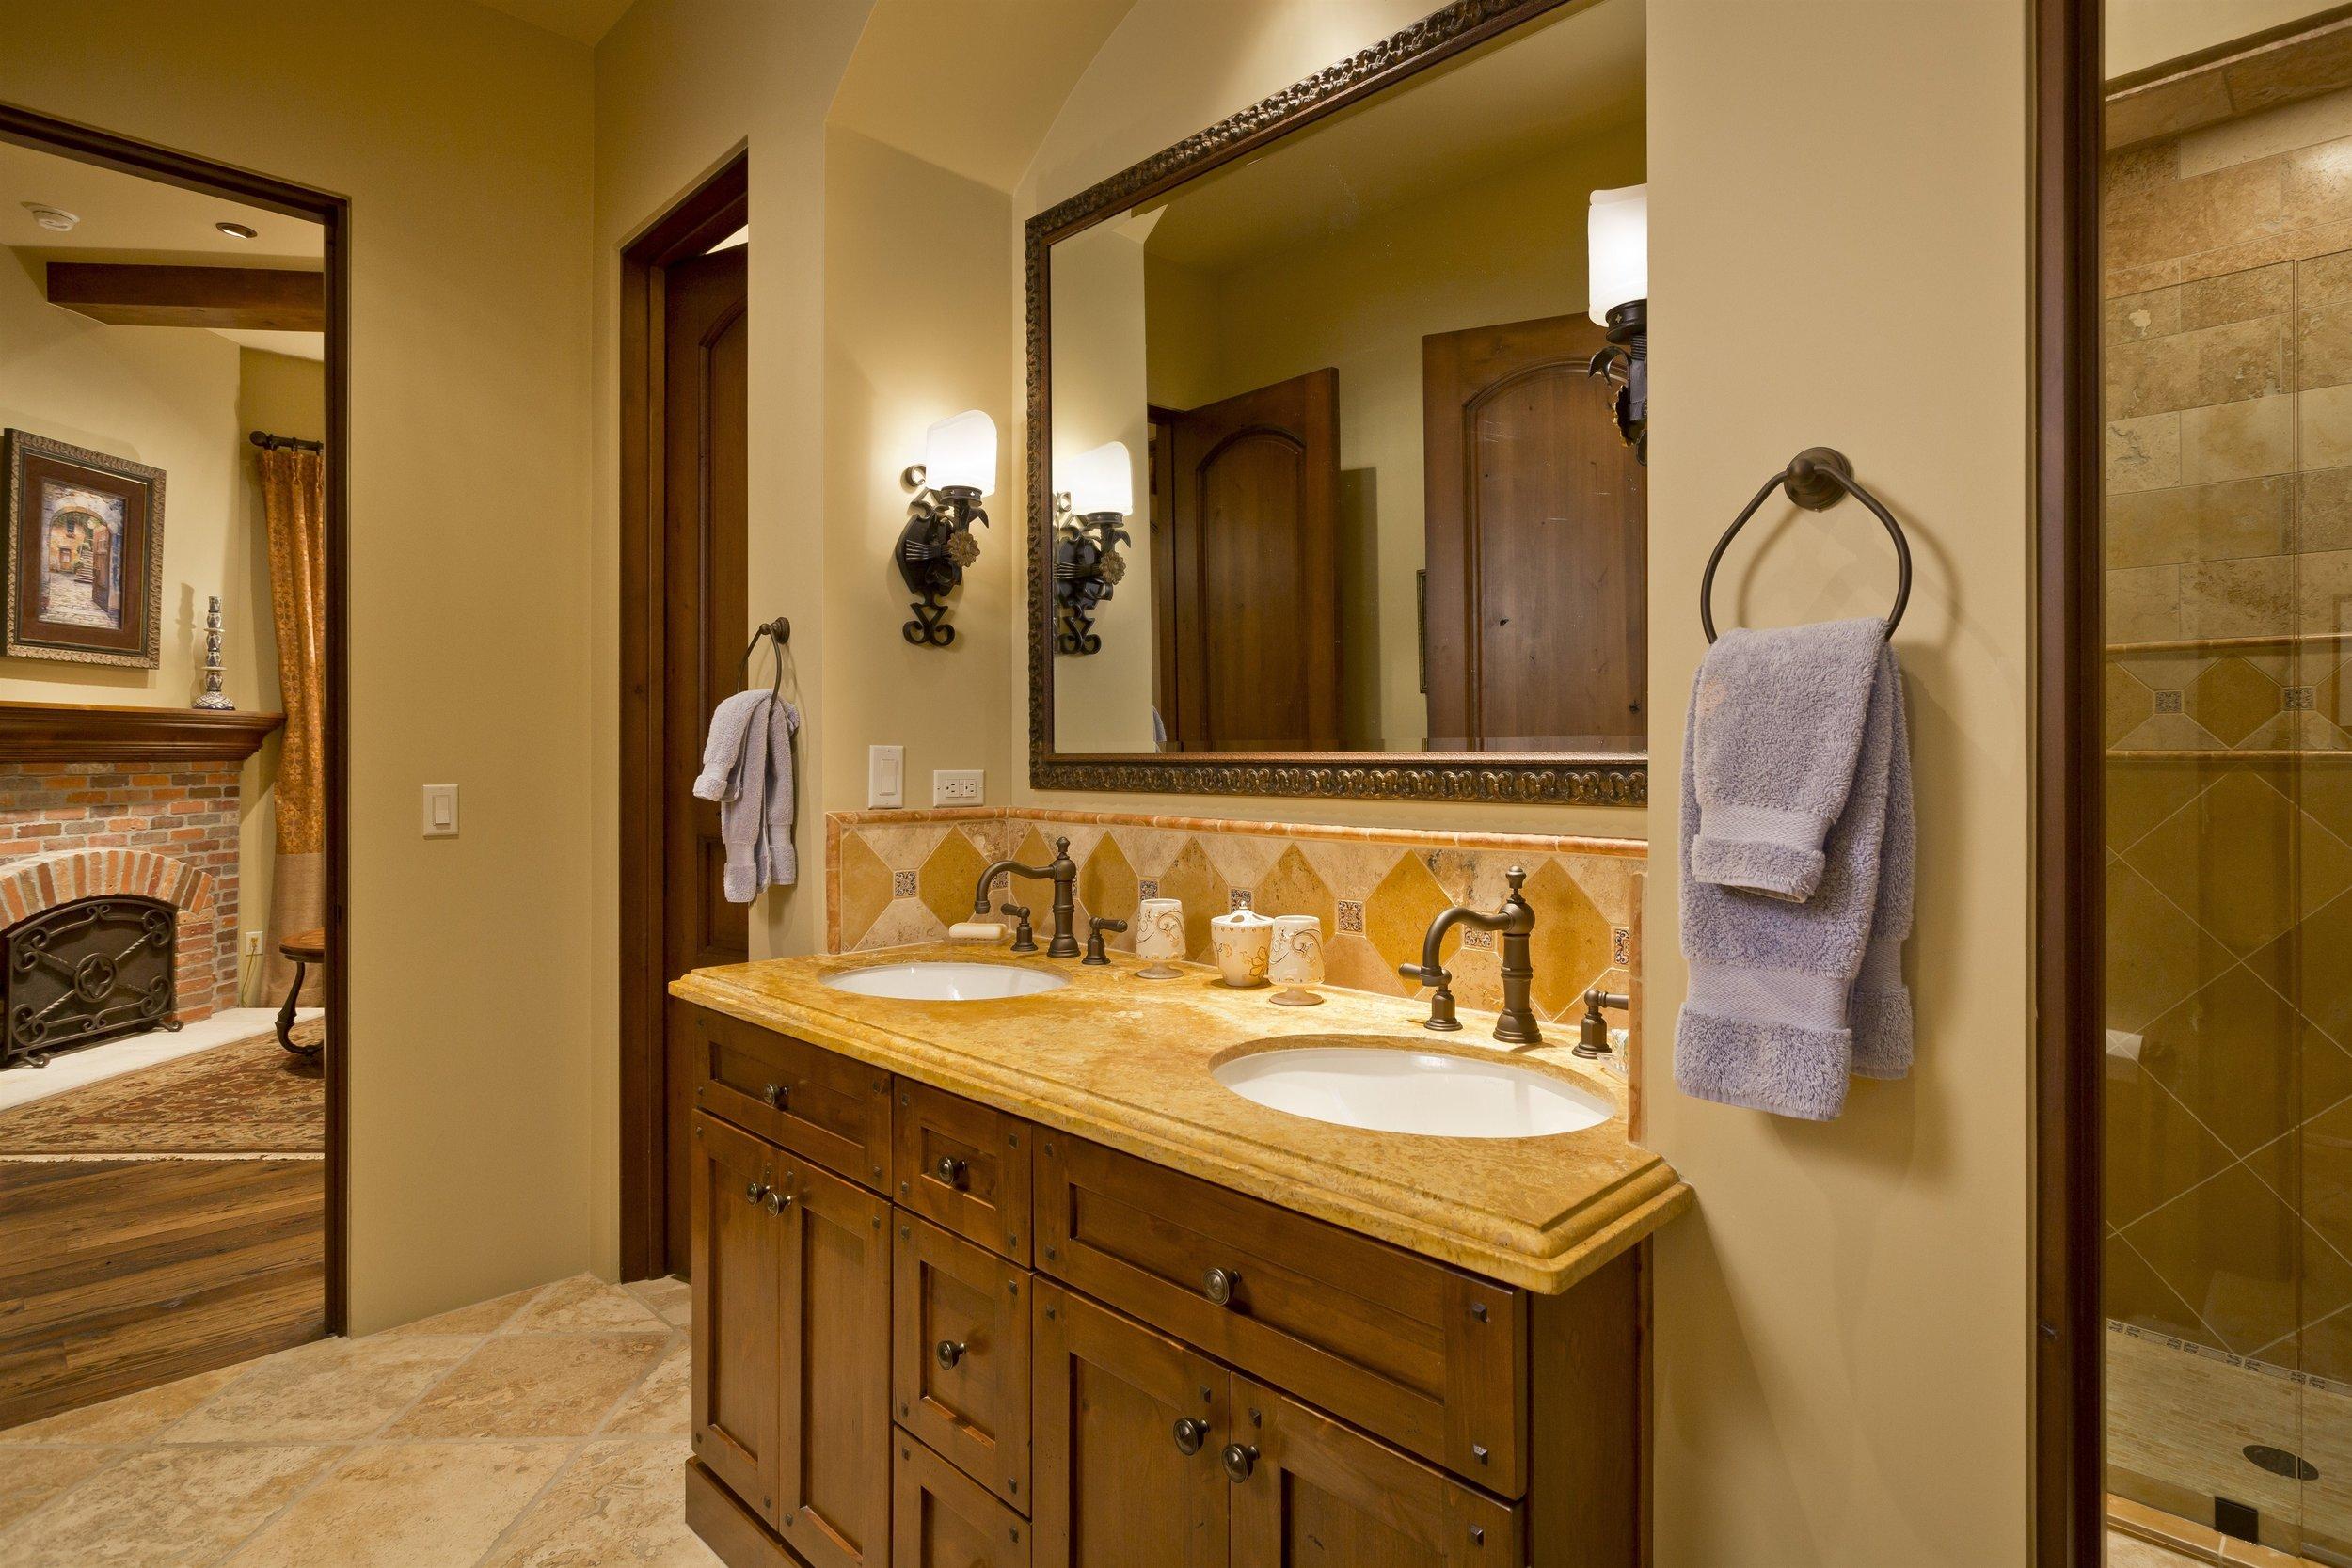 028_Bathroom.jpg